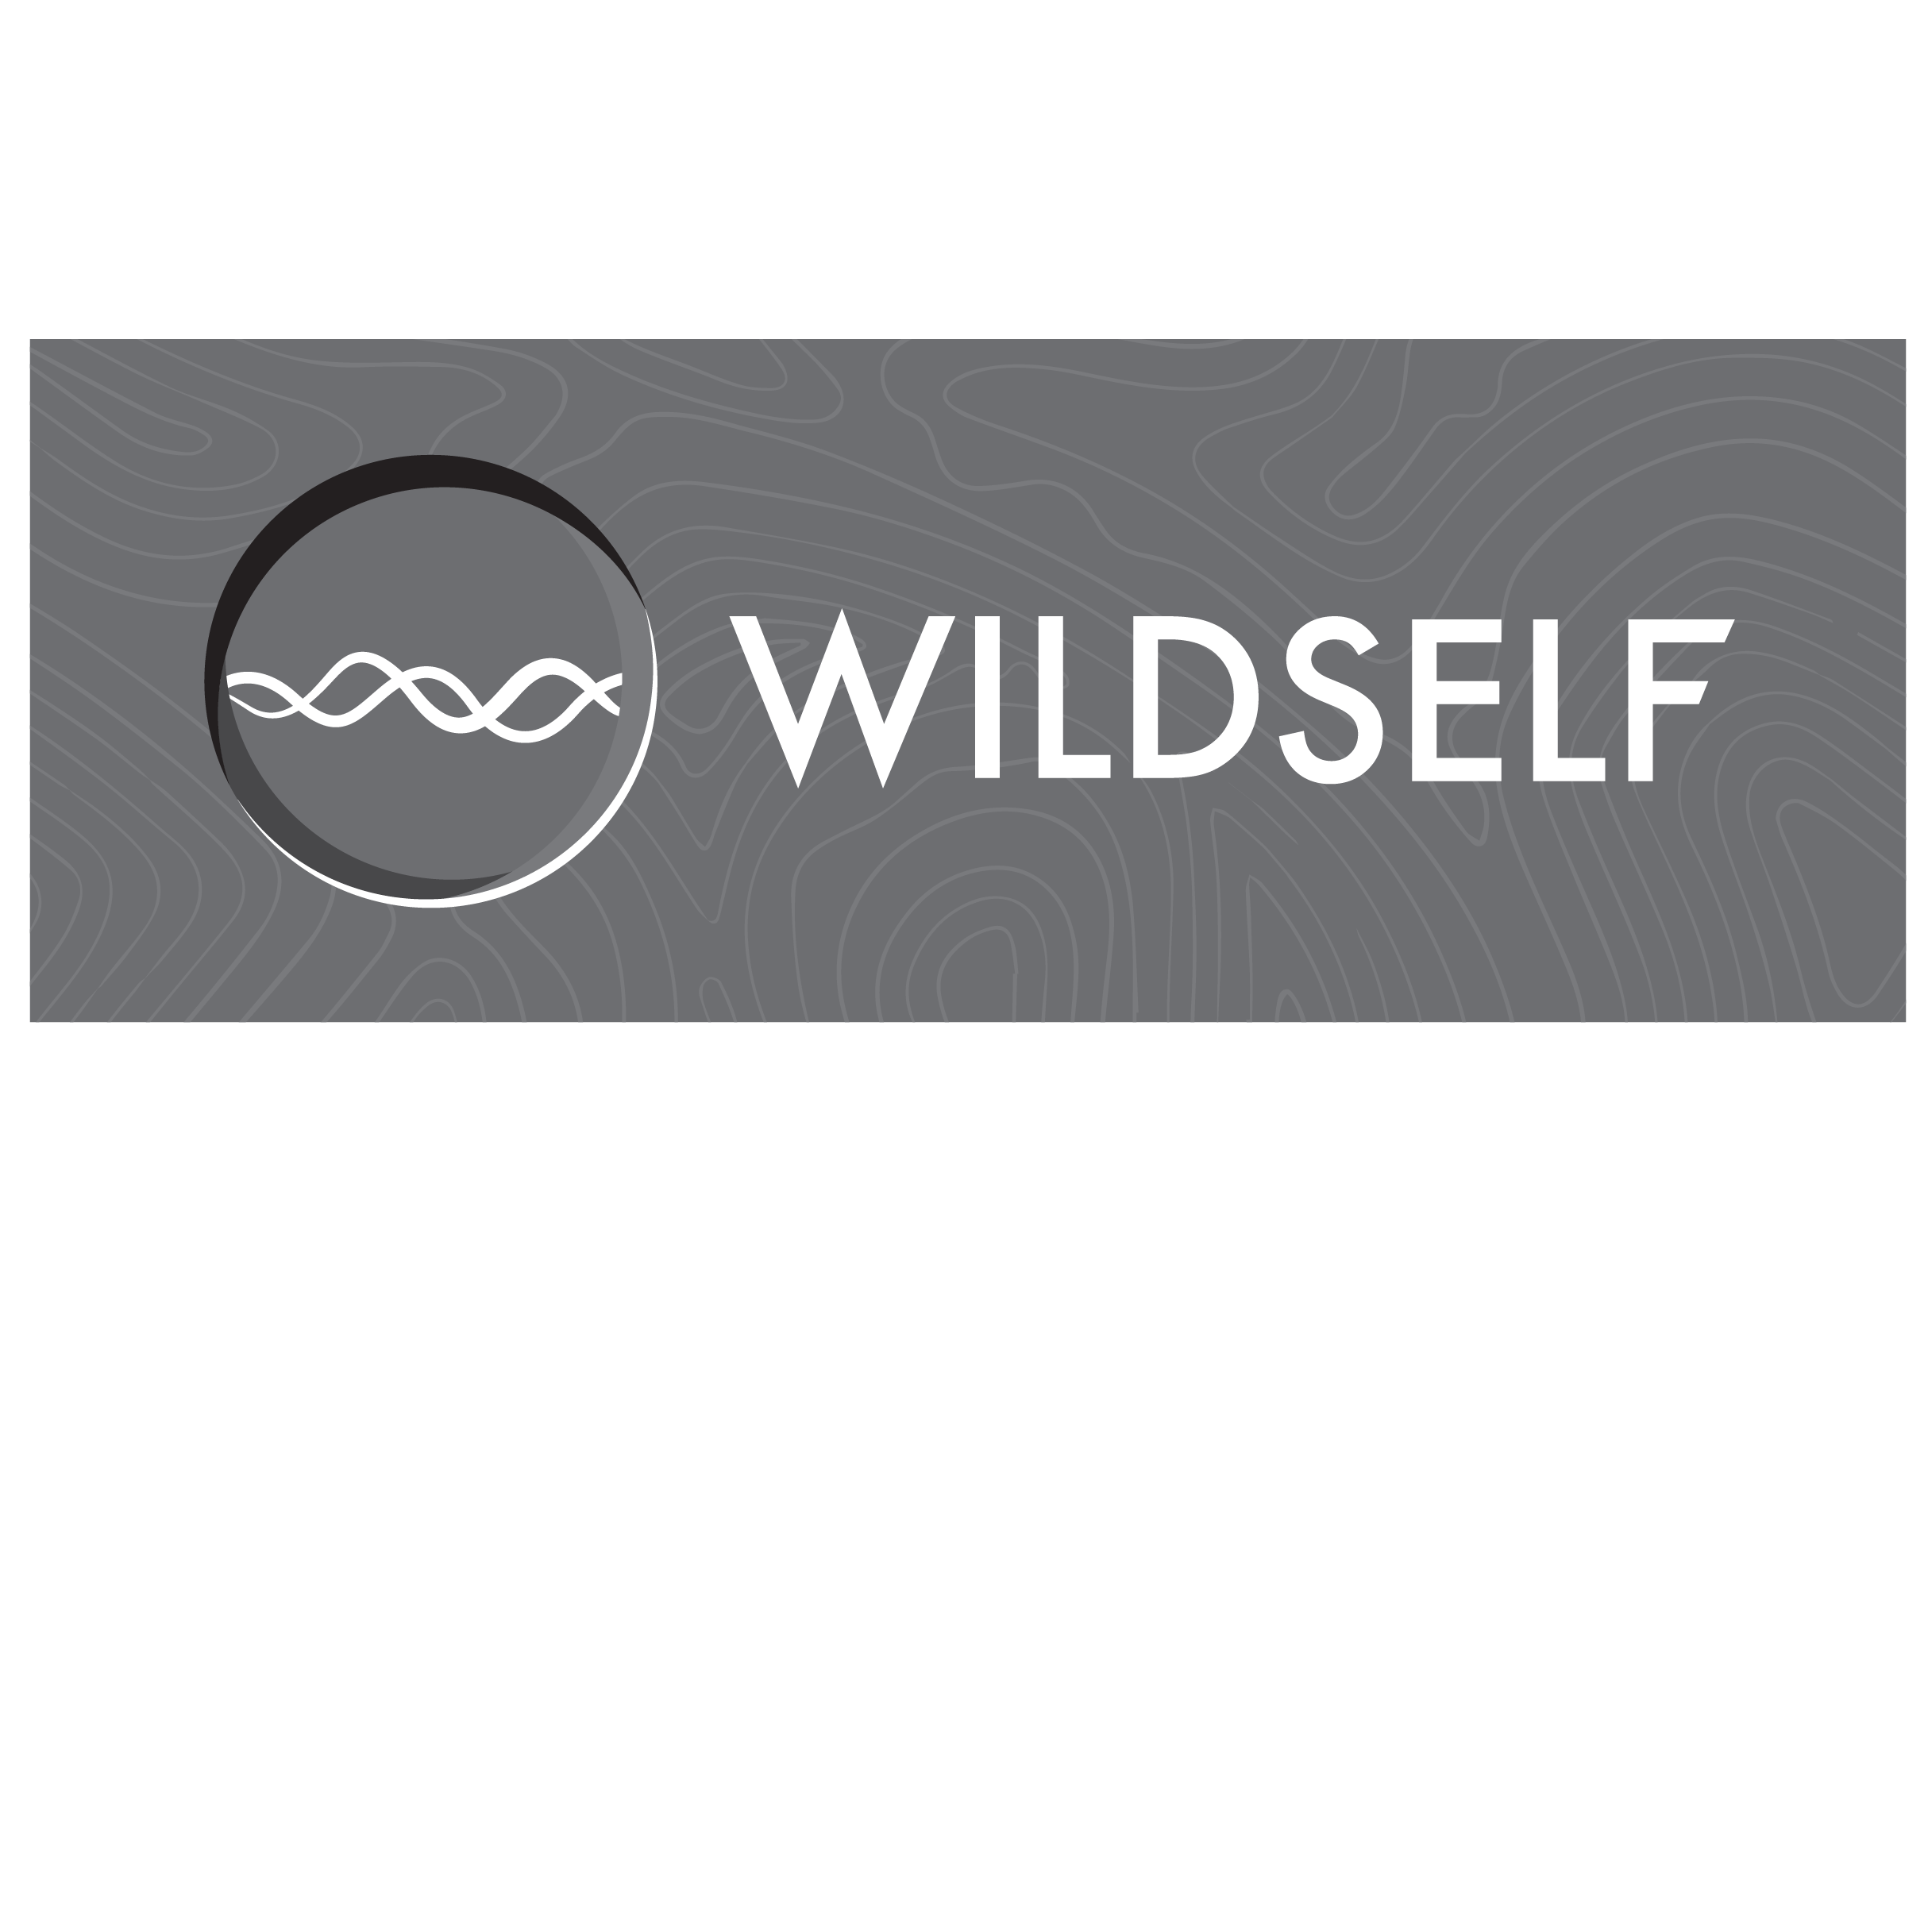 Wildself BG RGB.png